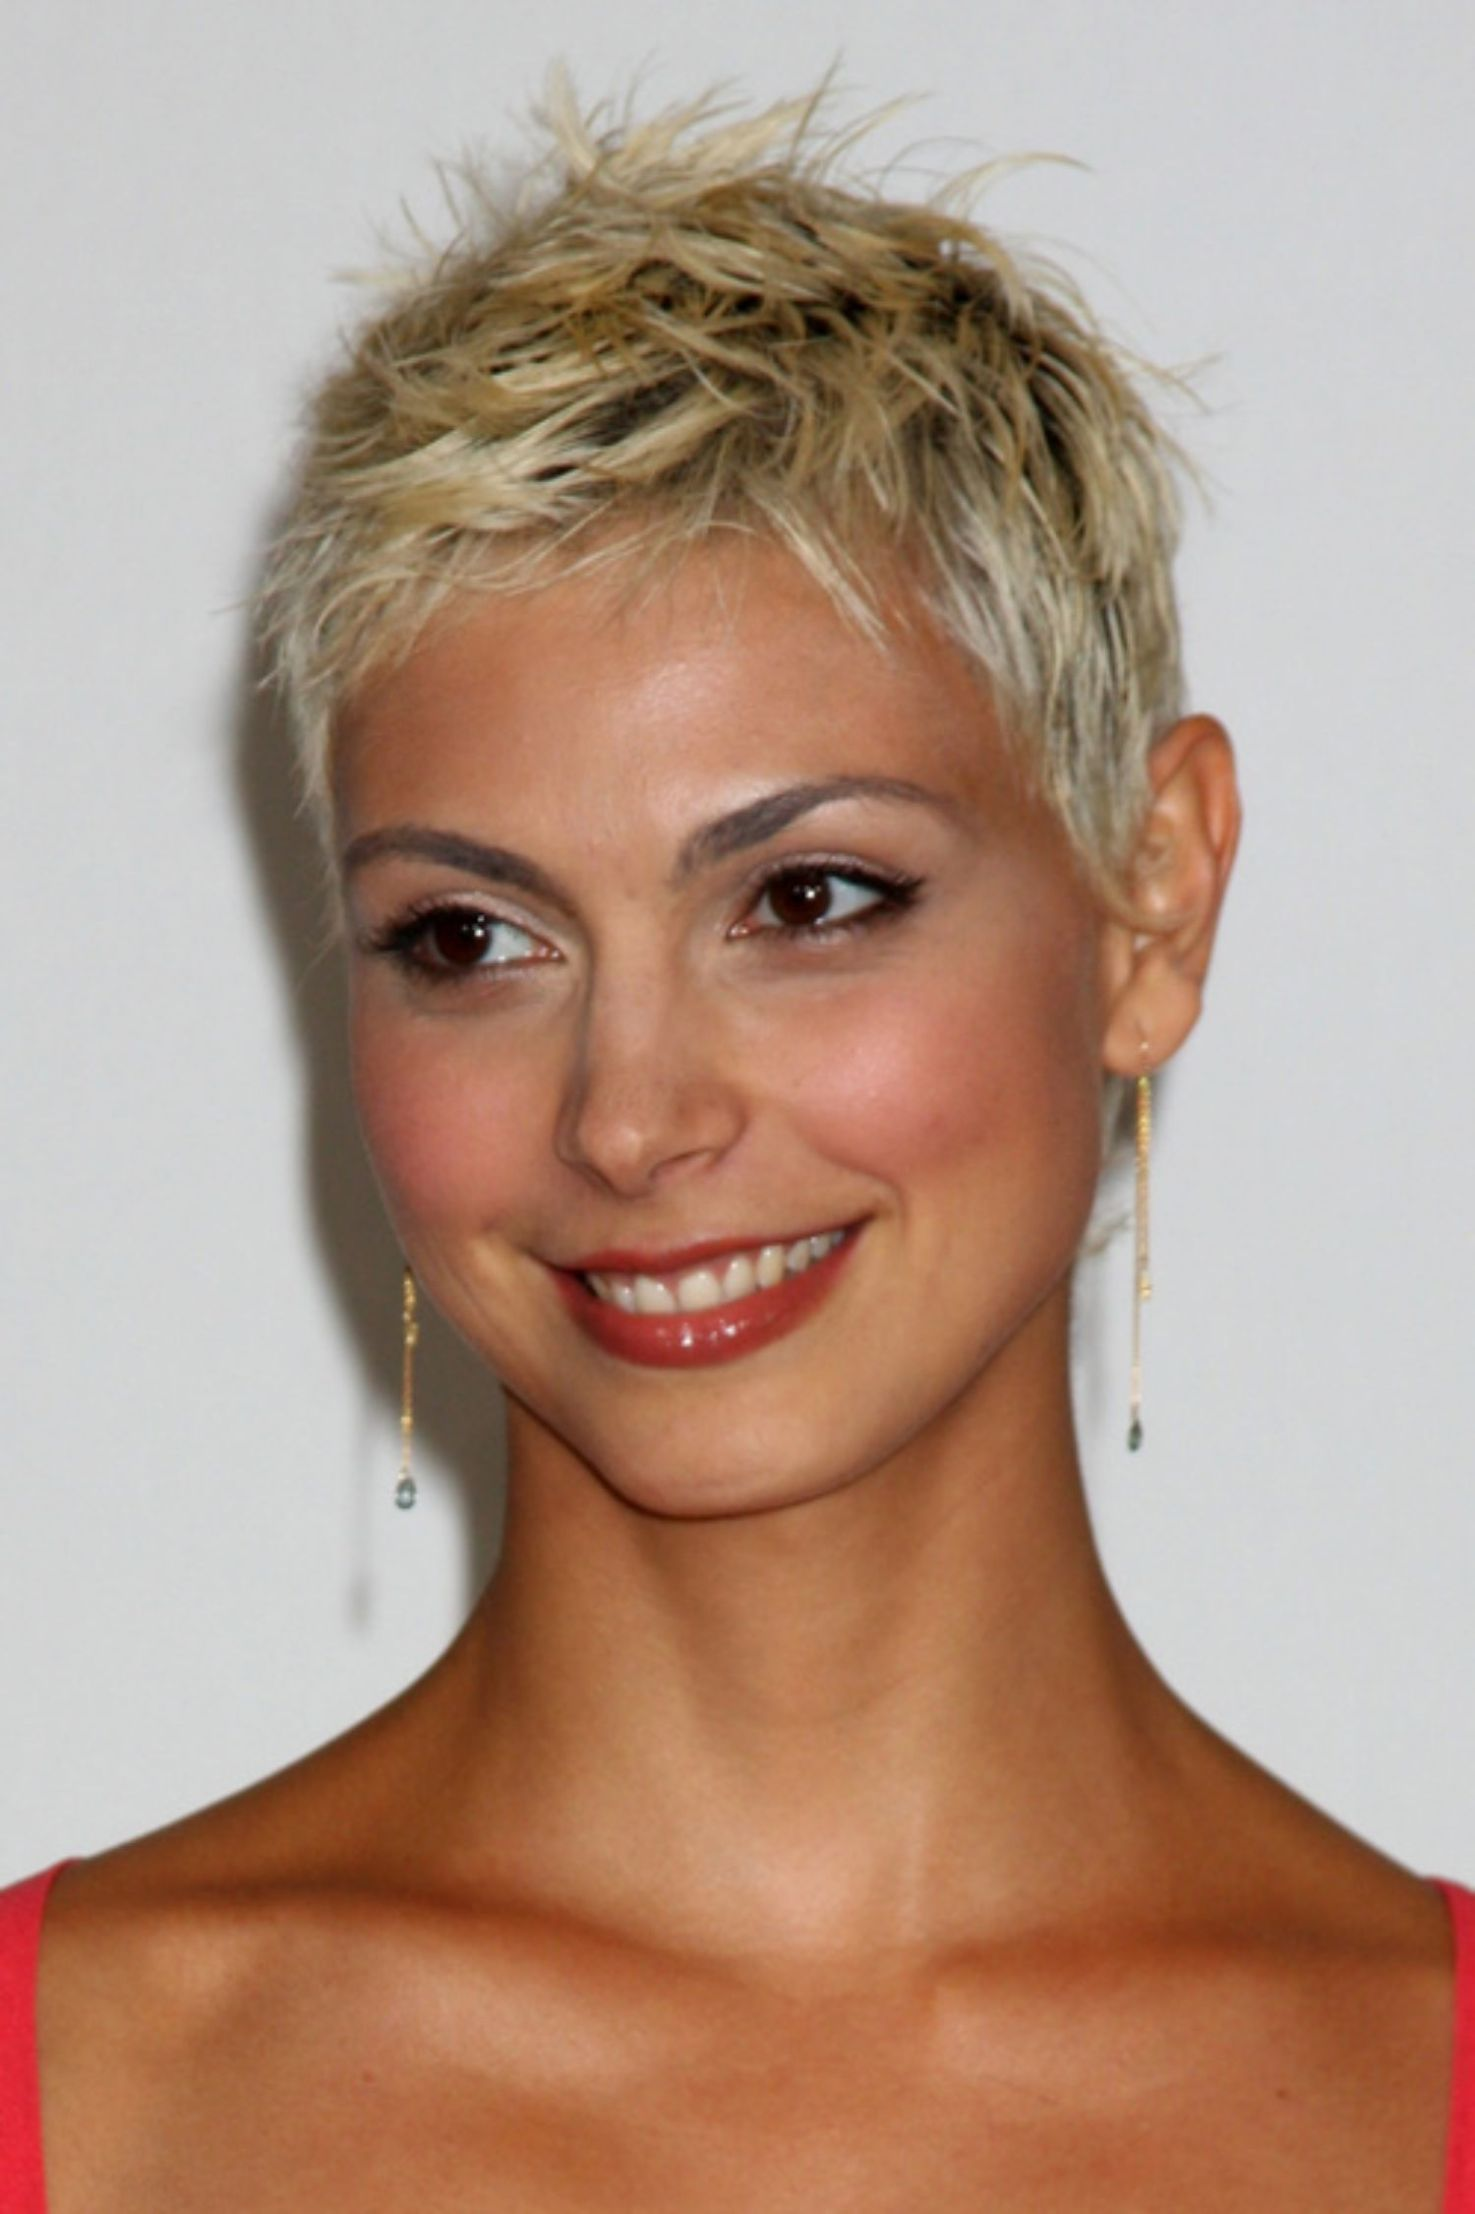 60 Cute Short Pixie Haircuts - Femininity and Practicality ...